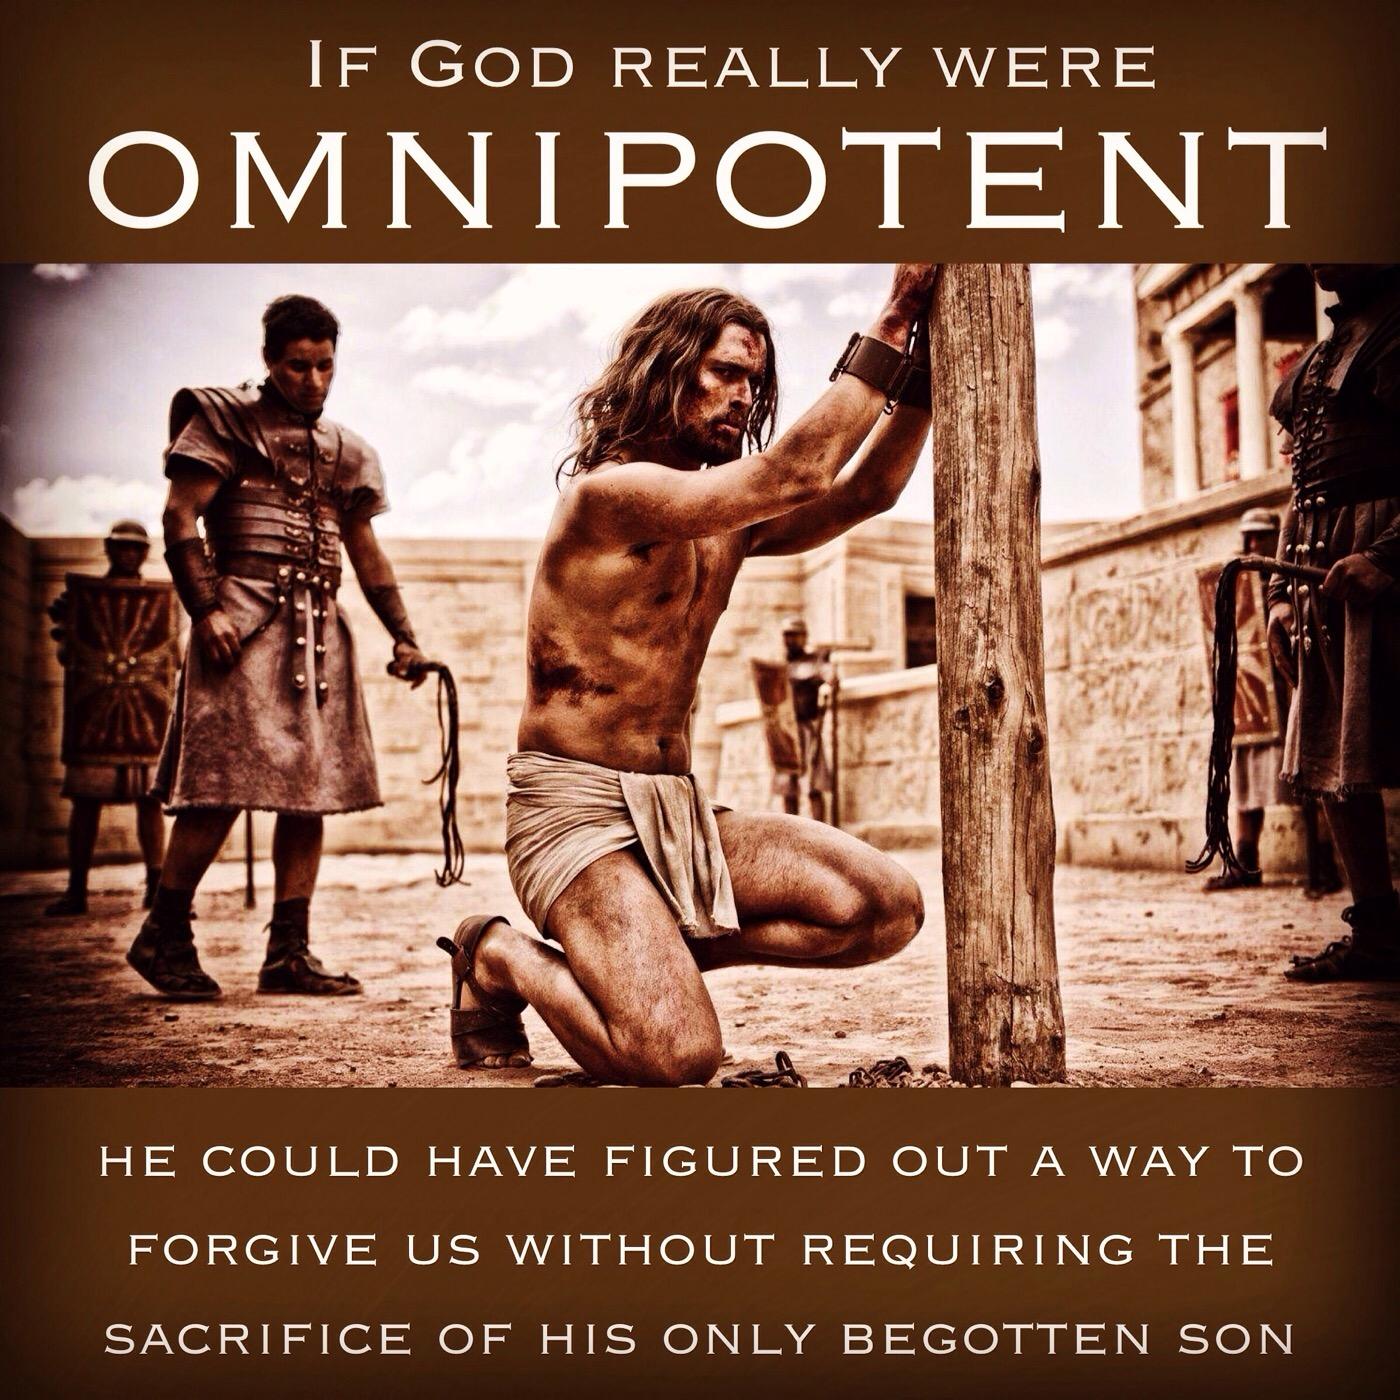 Omnipotent sadism